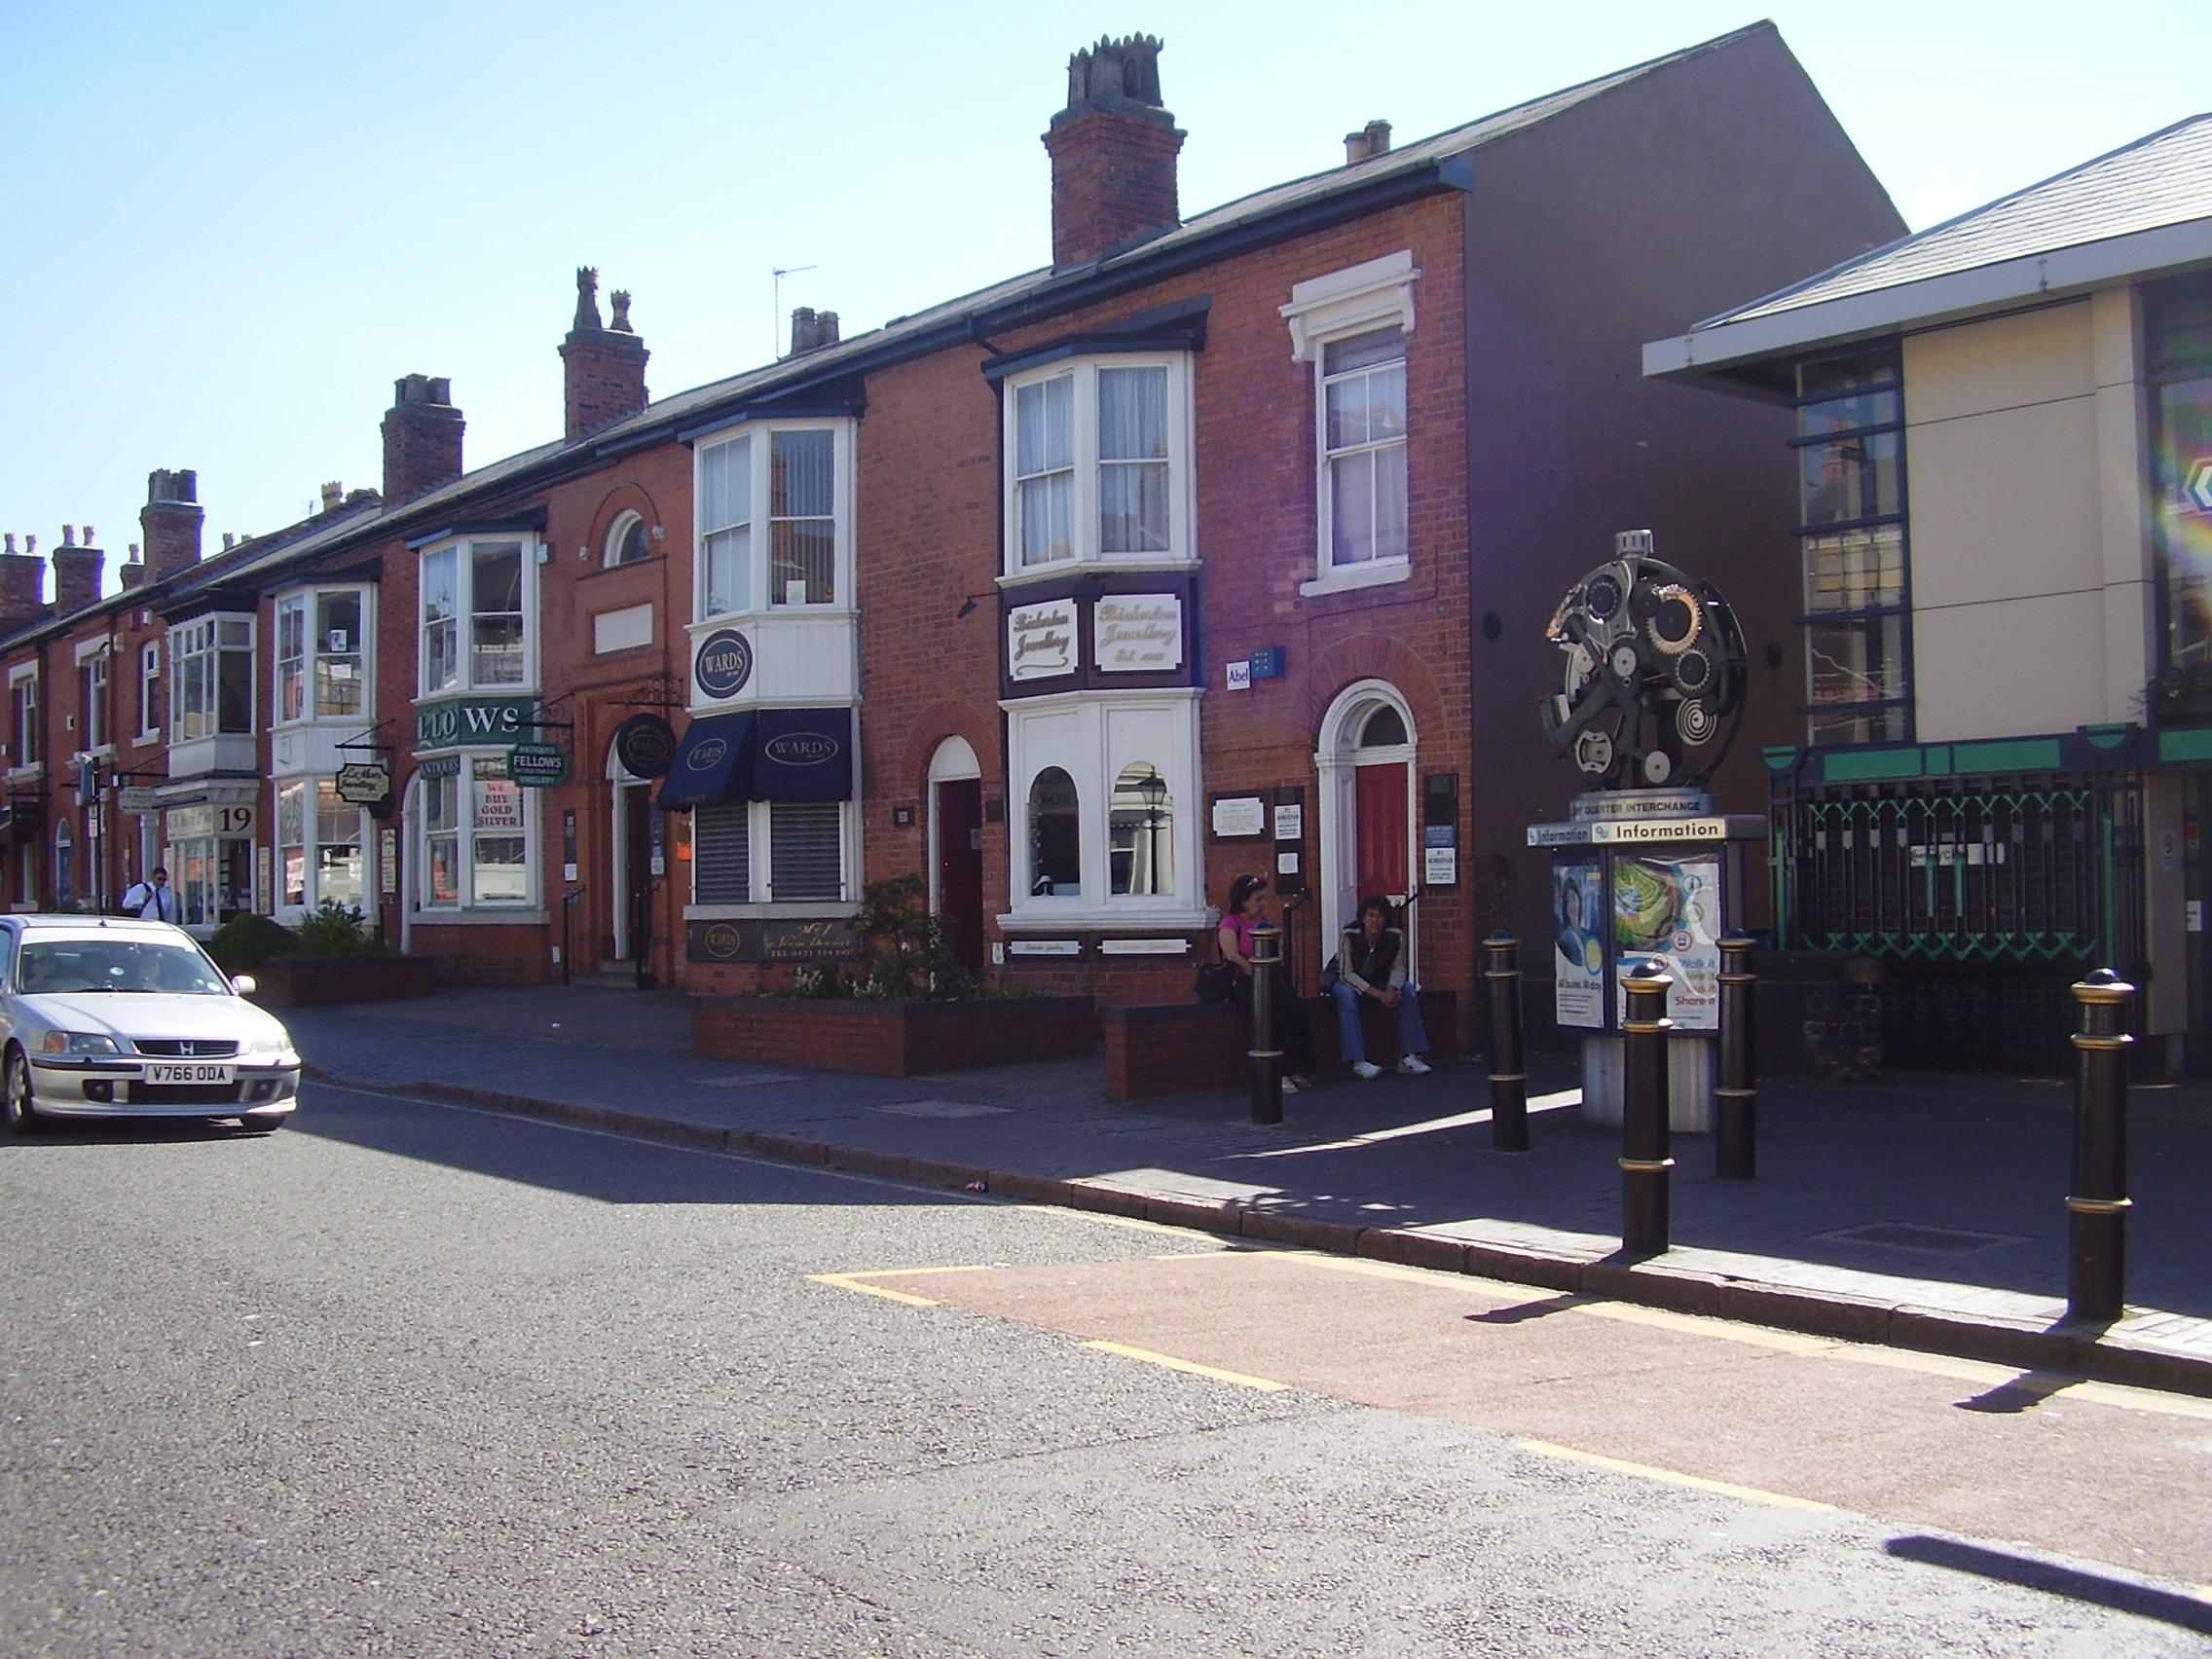 Jewellery Shops in Vyse St, Jewellery Quarter Birmingham 2008